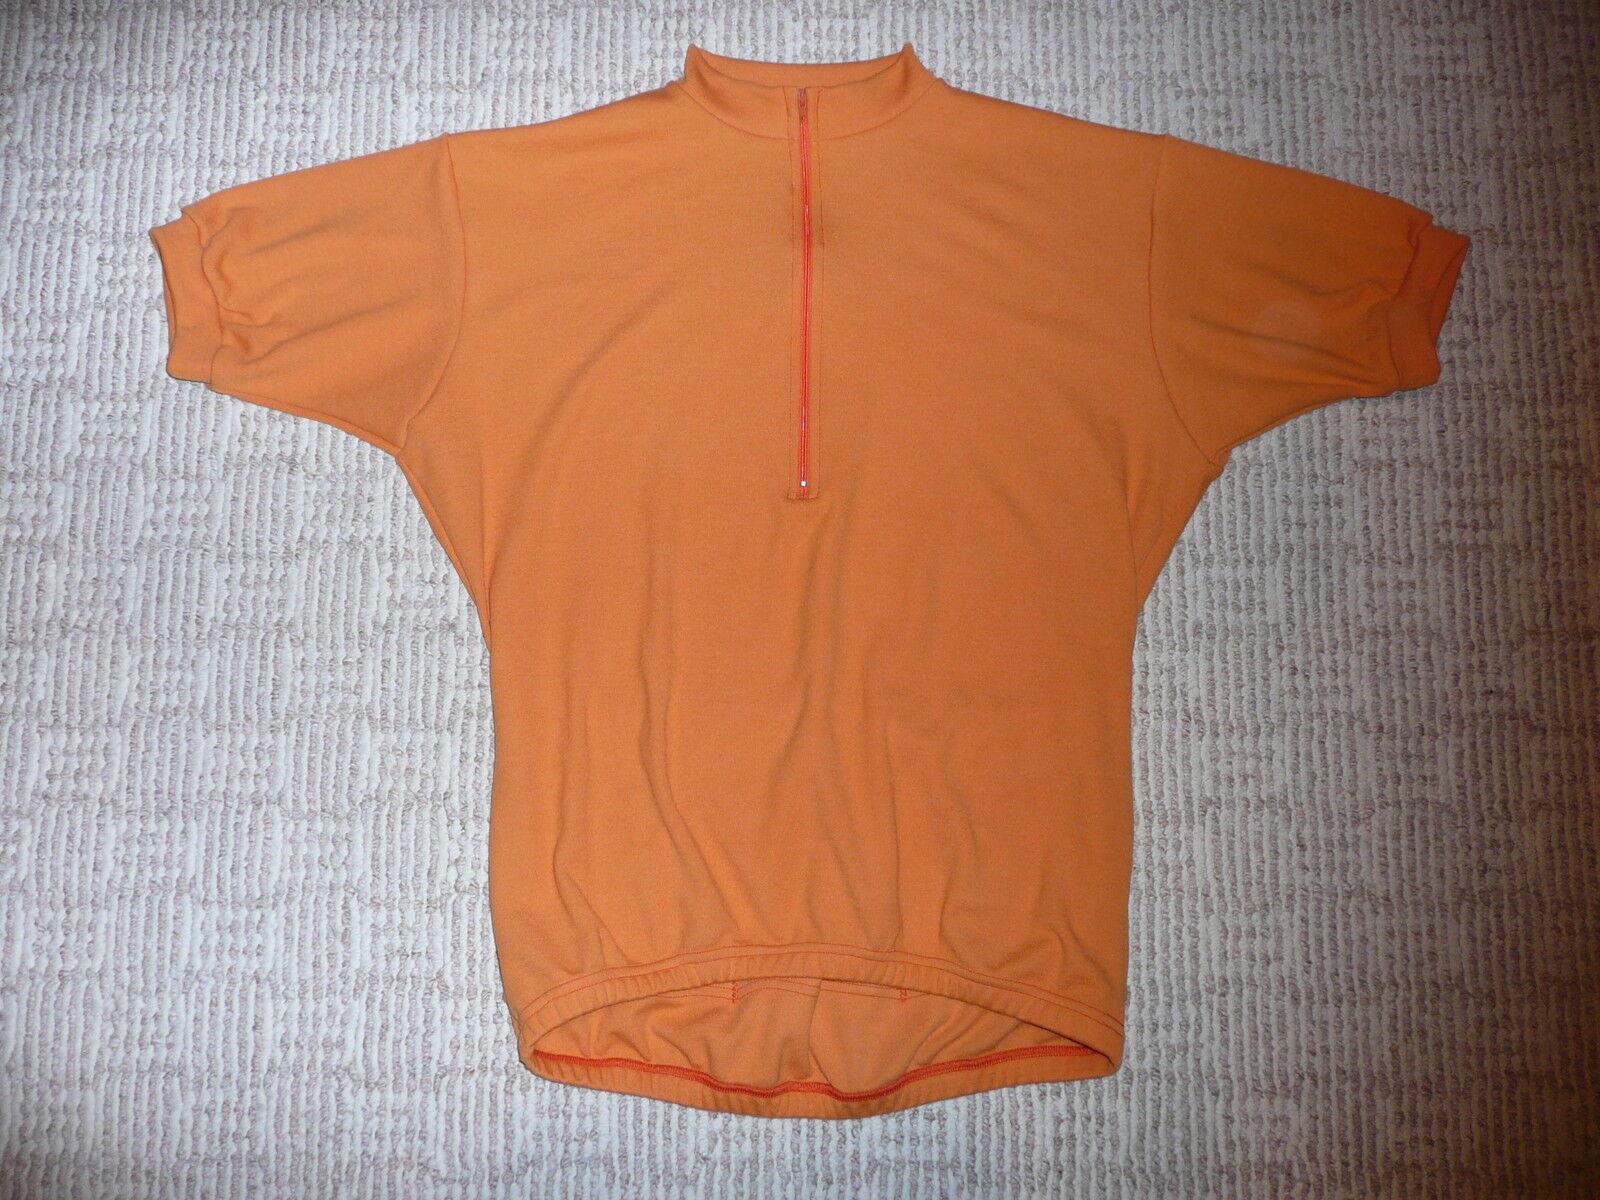 WOOL VINTAGE  RETRO CLASSIC  BIKE JERSEY  XL SHORT SLEEVE classic orange